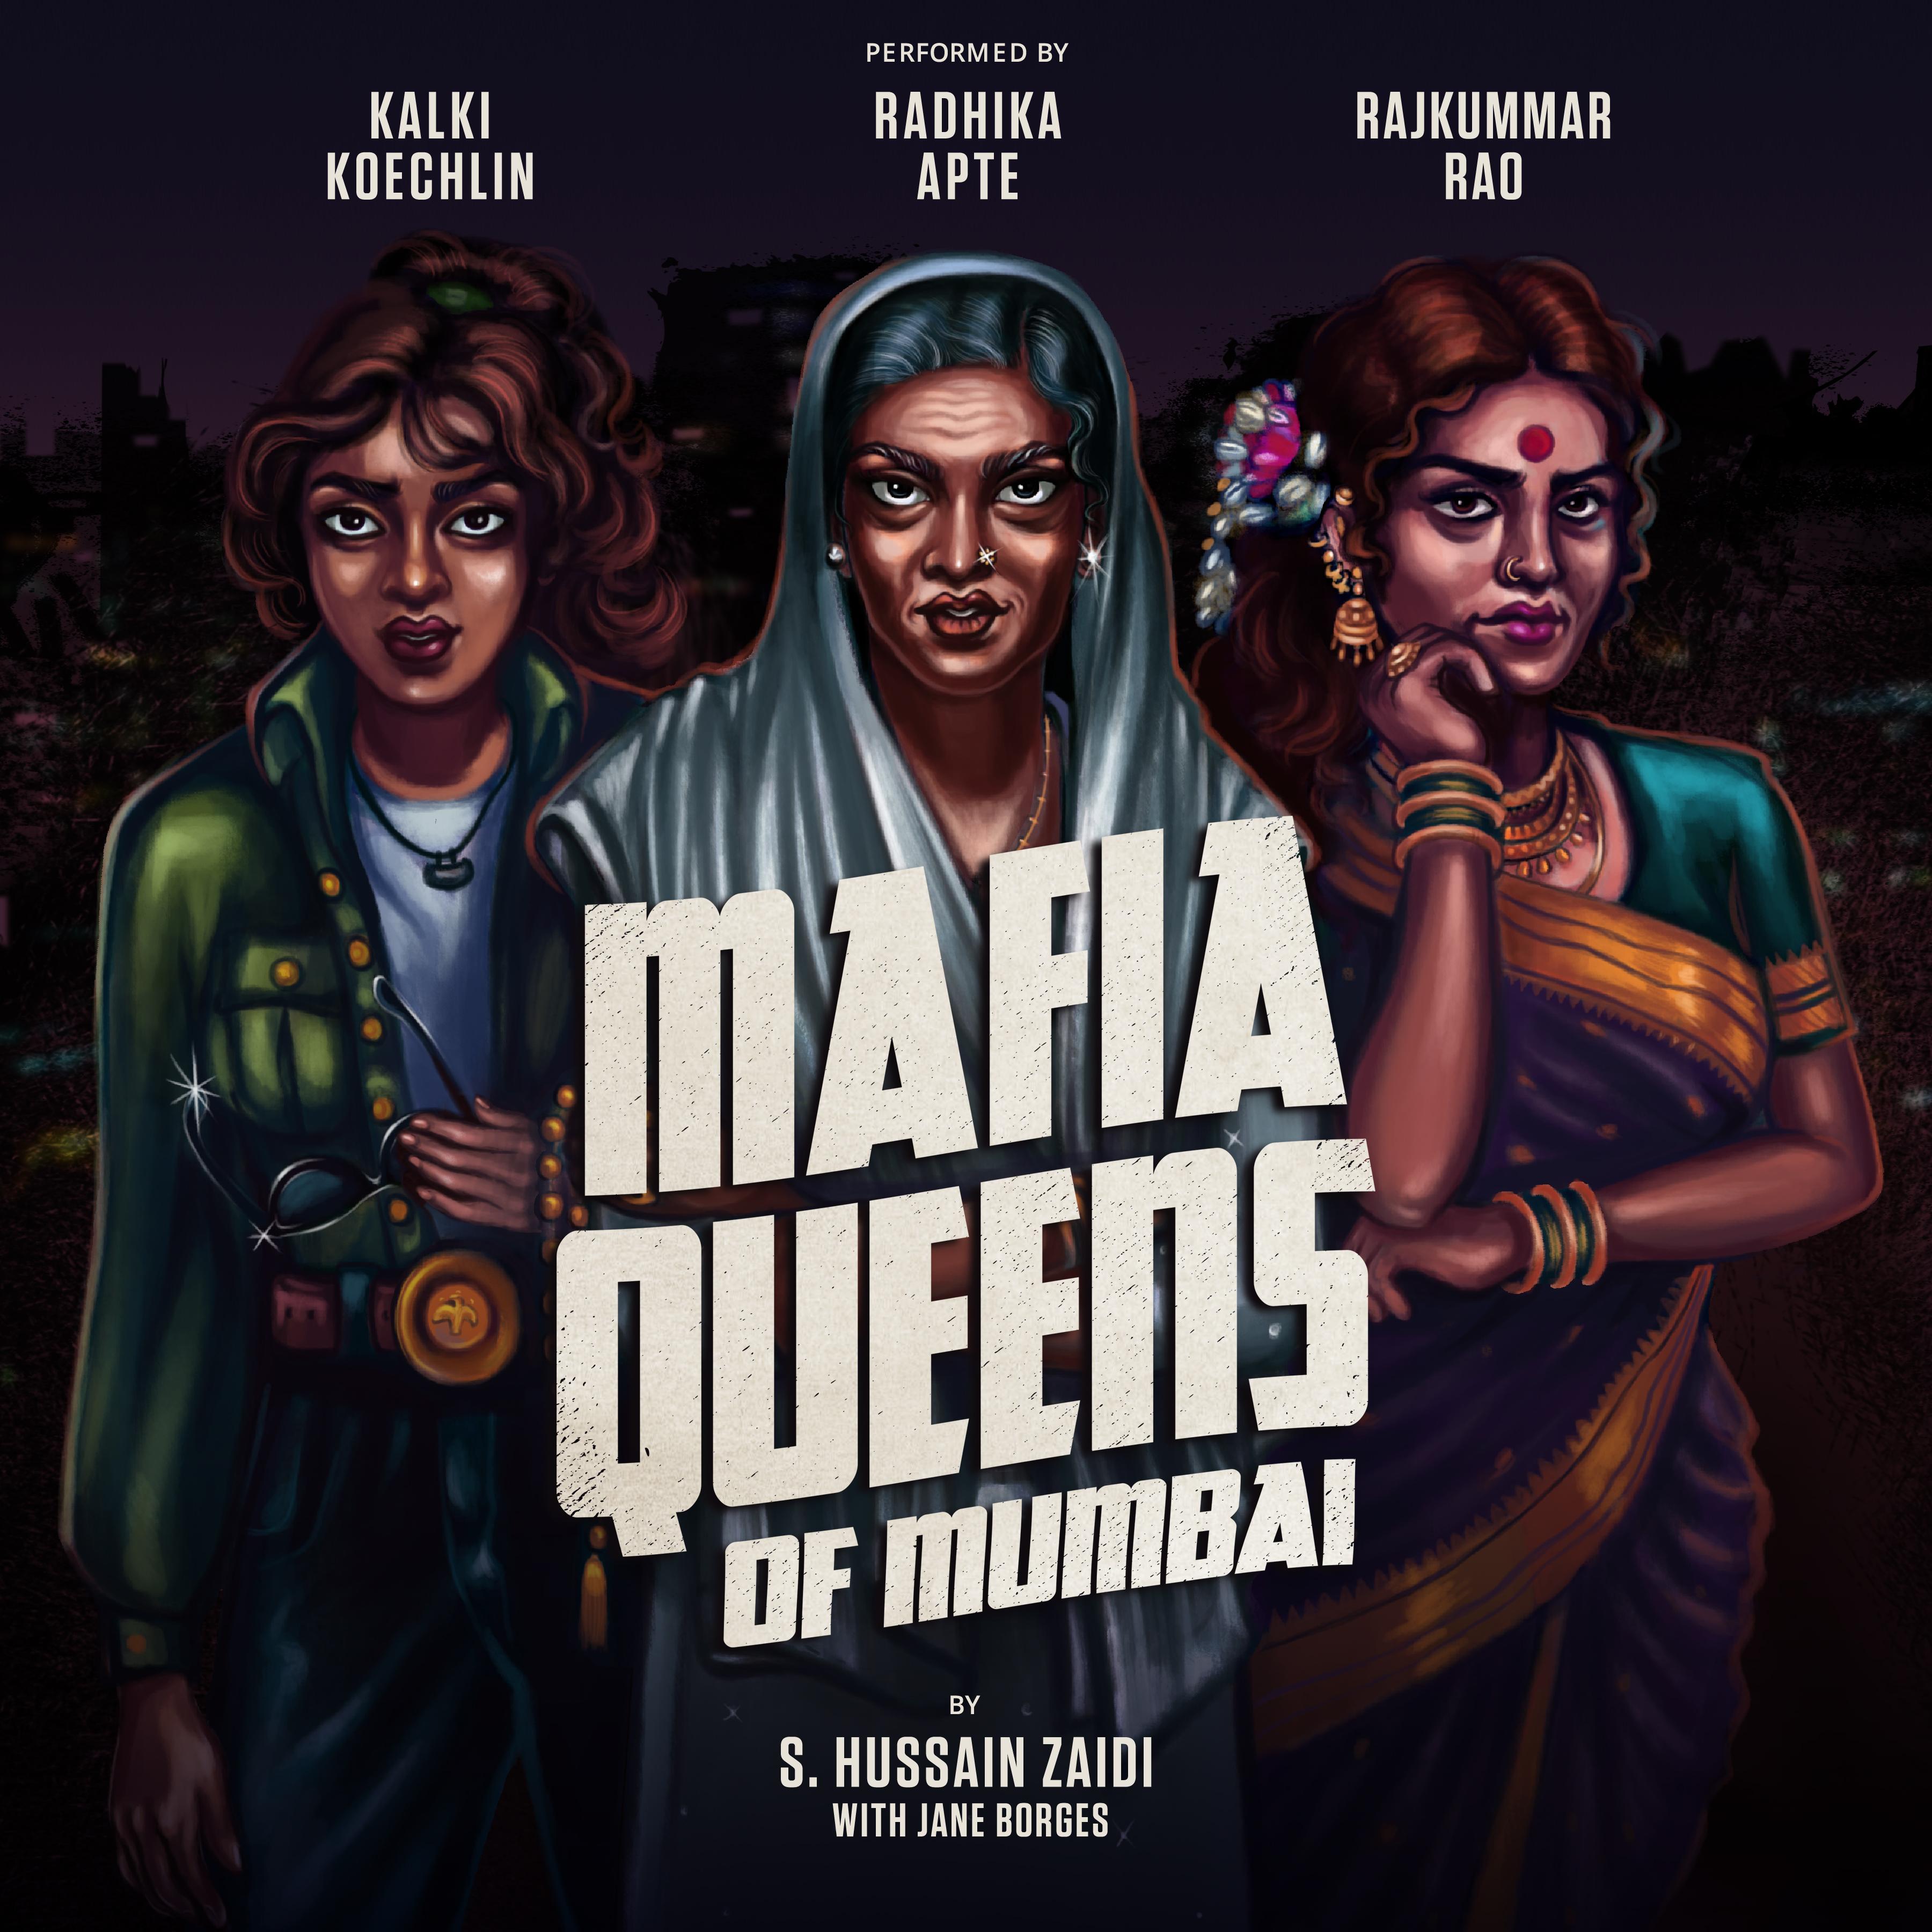 Mafia-Queens-Final-BG edit 09-10-18